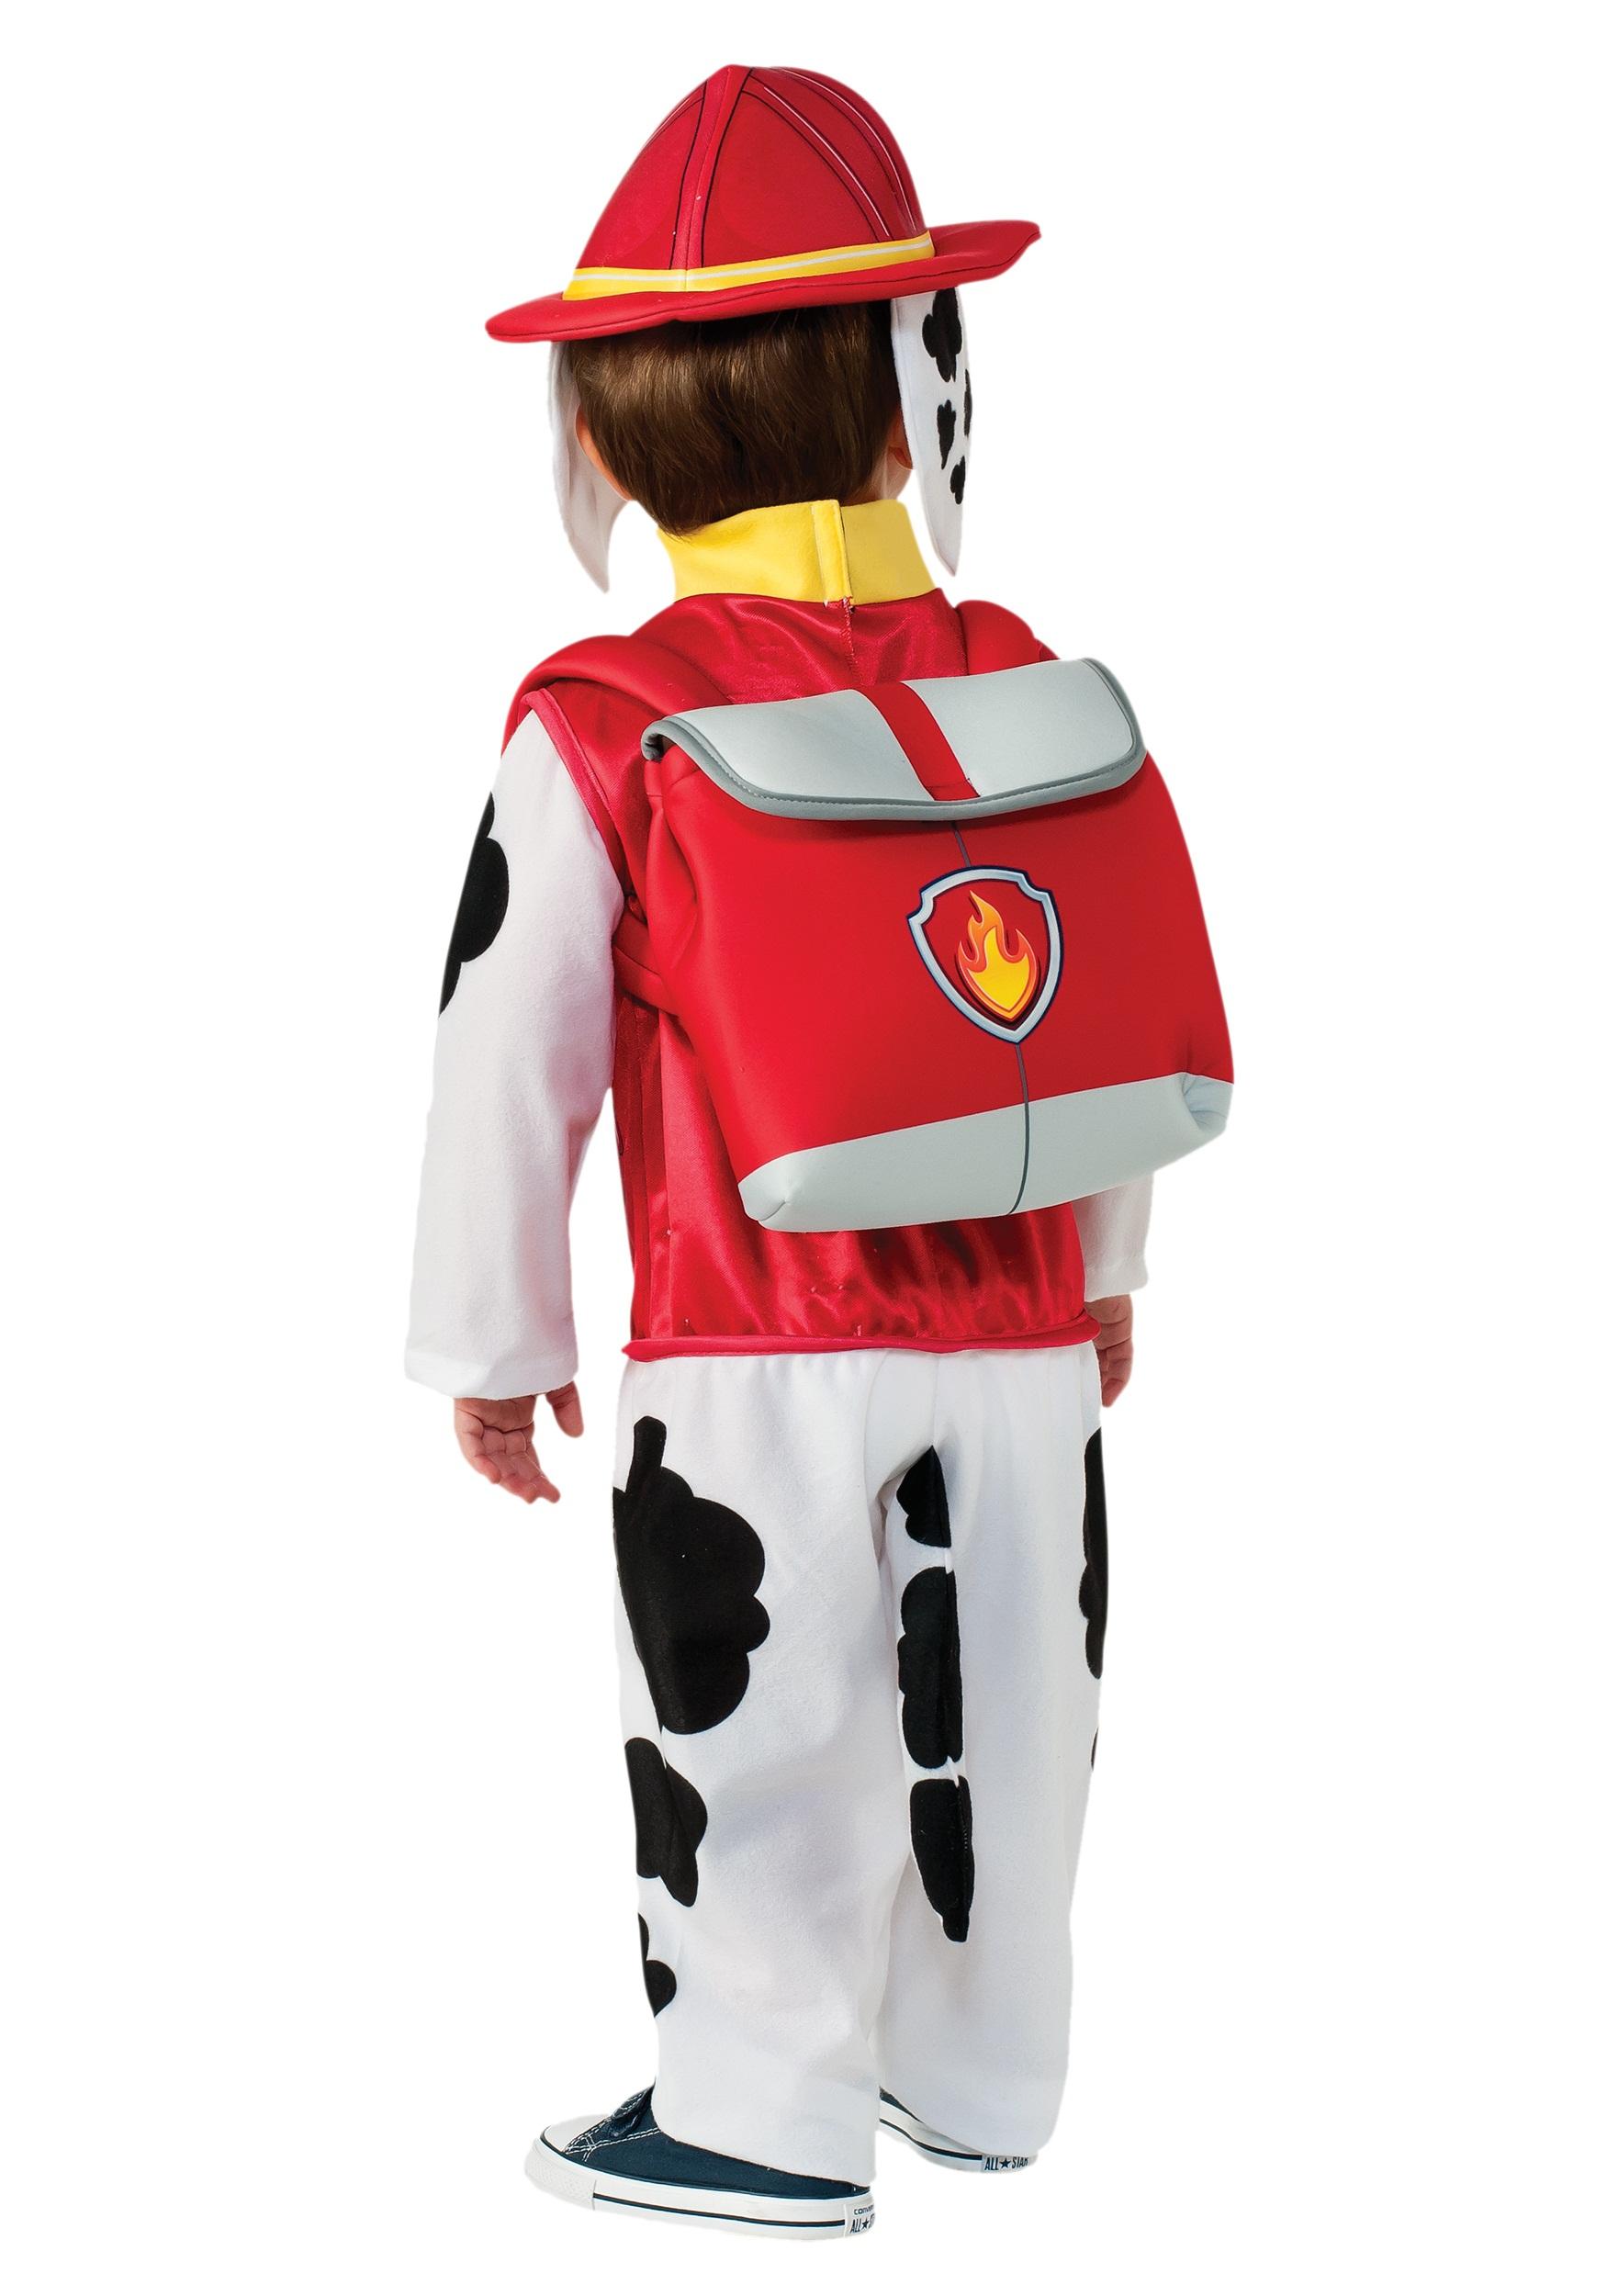 Fireman Child Accessory Kit Paw Patrol Marshall Child Costume Alt